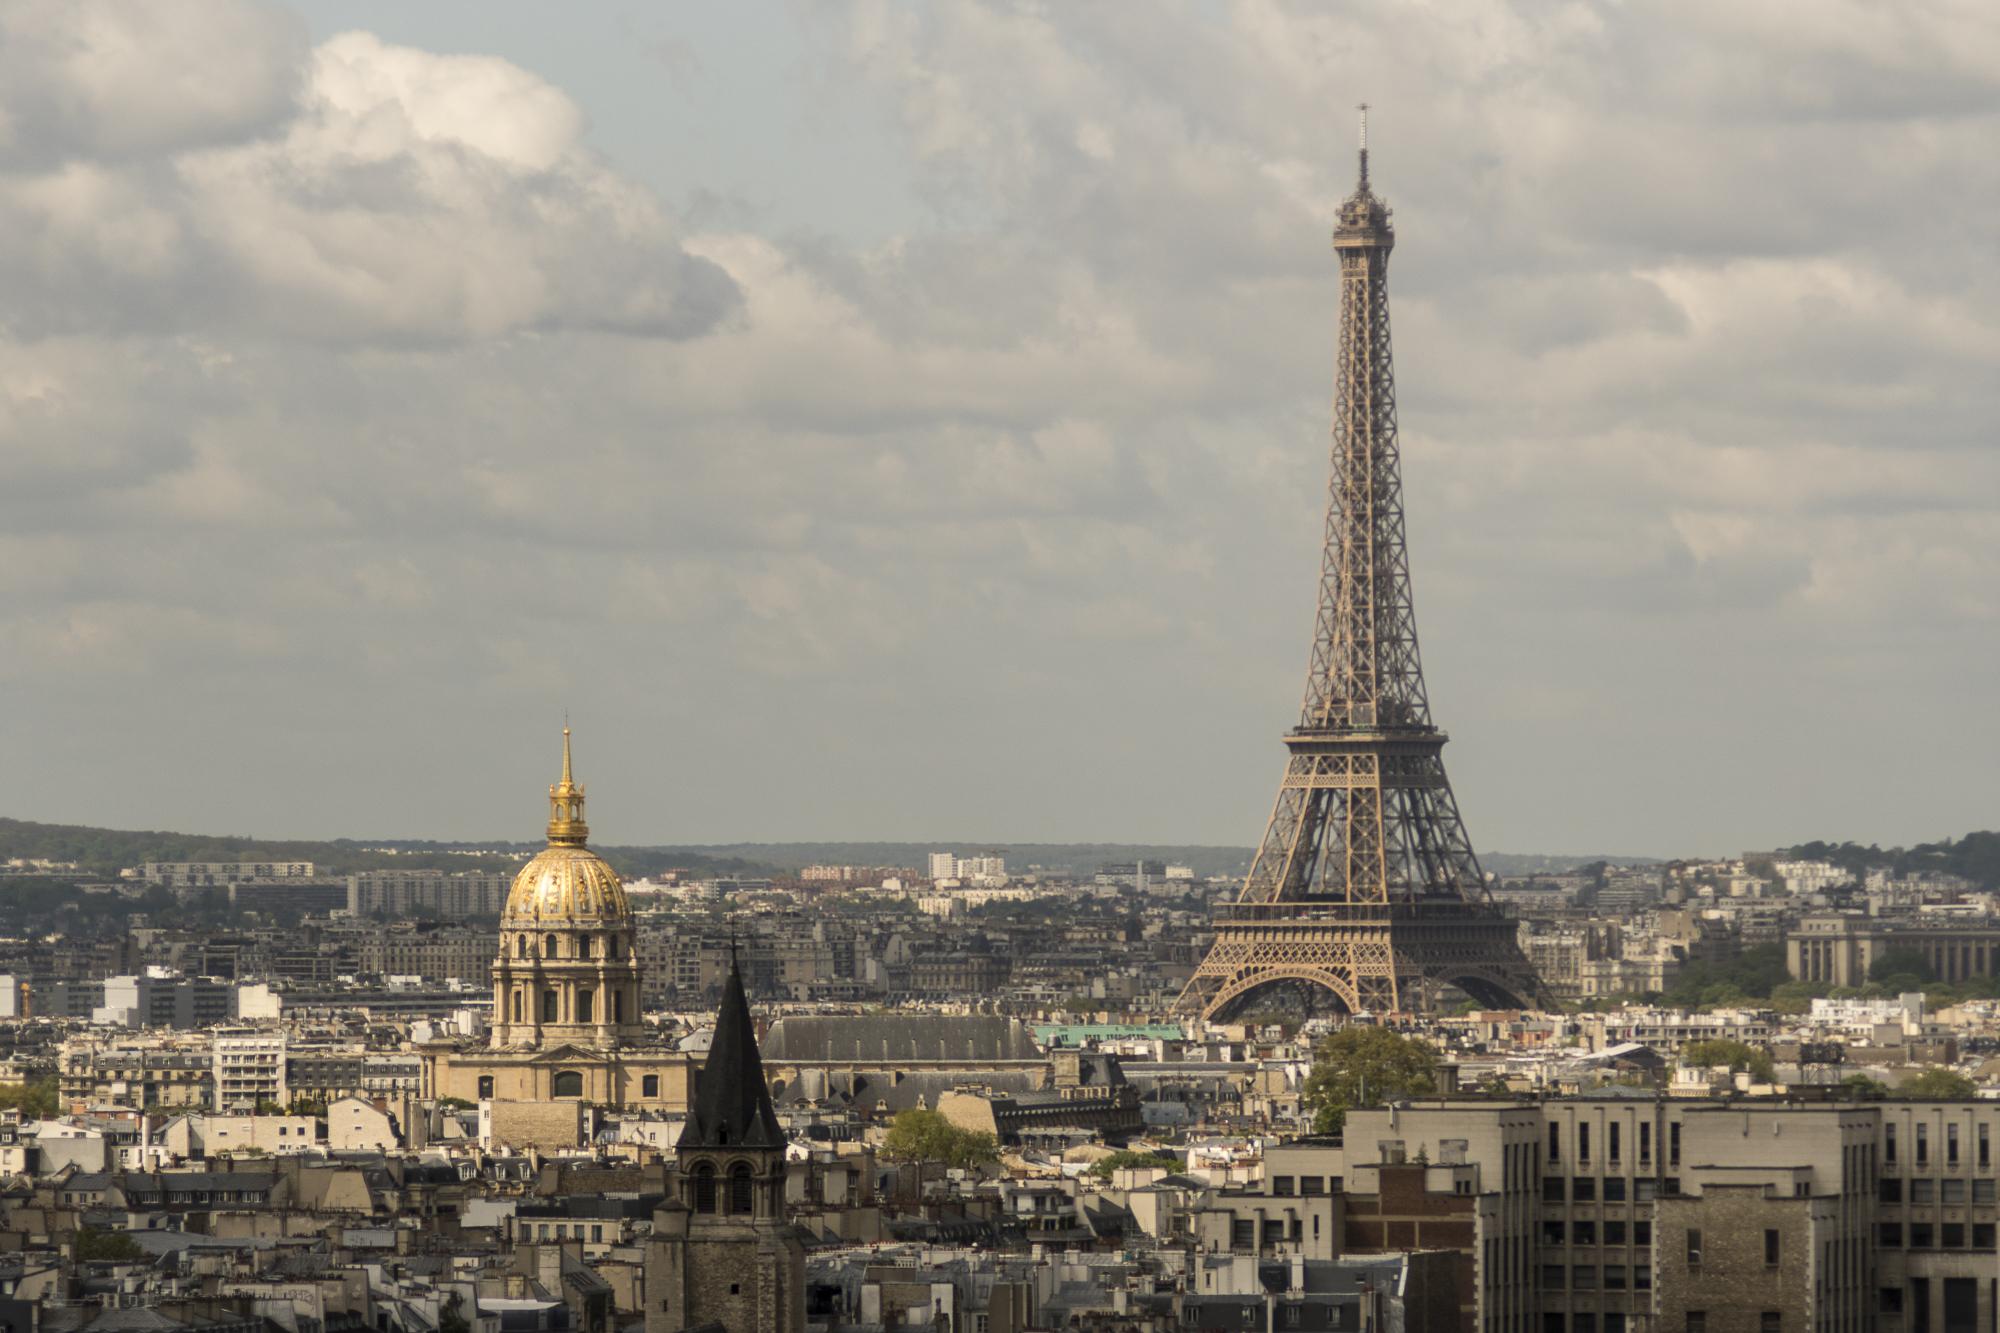 Eiffel Tower From the Belfry  PHOTOGRAPHY : ALEXANDER J.E. BRADLEY •Nikon D500 • AF Zoom-NIKKOR 80-200mm f/2.8D ED • 145mM • F2.8 • 1/6400 •ISO 100